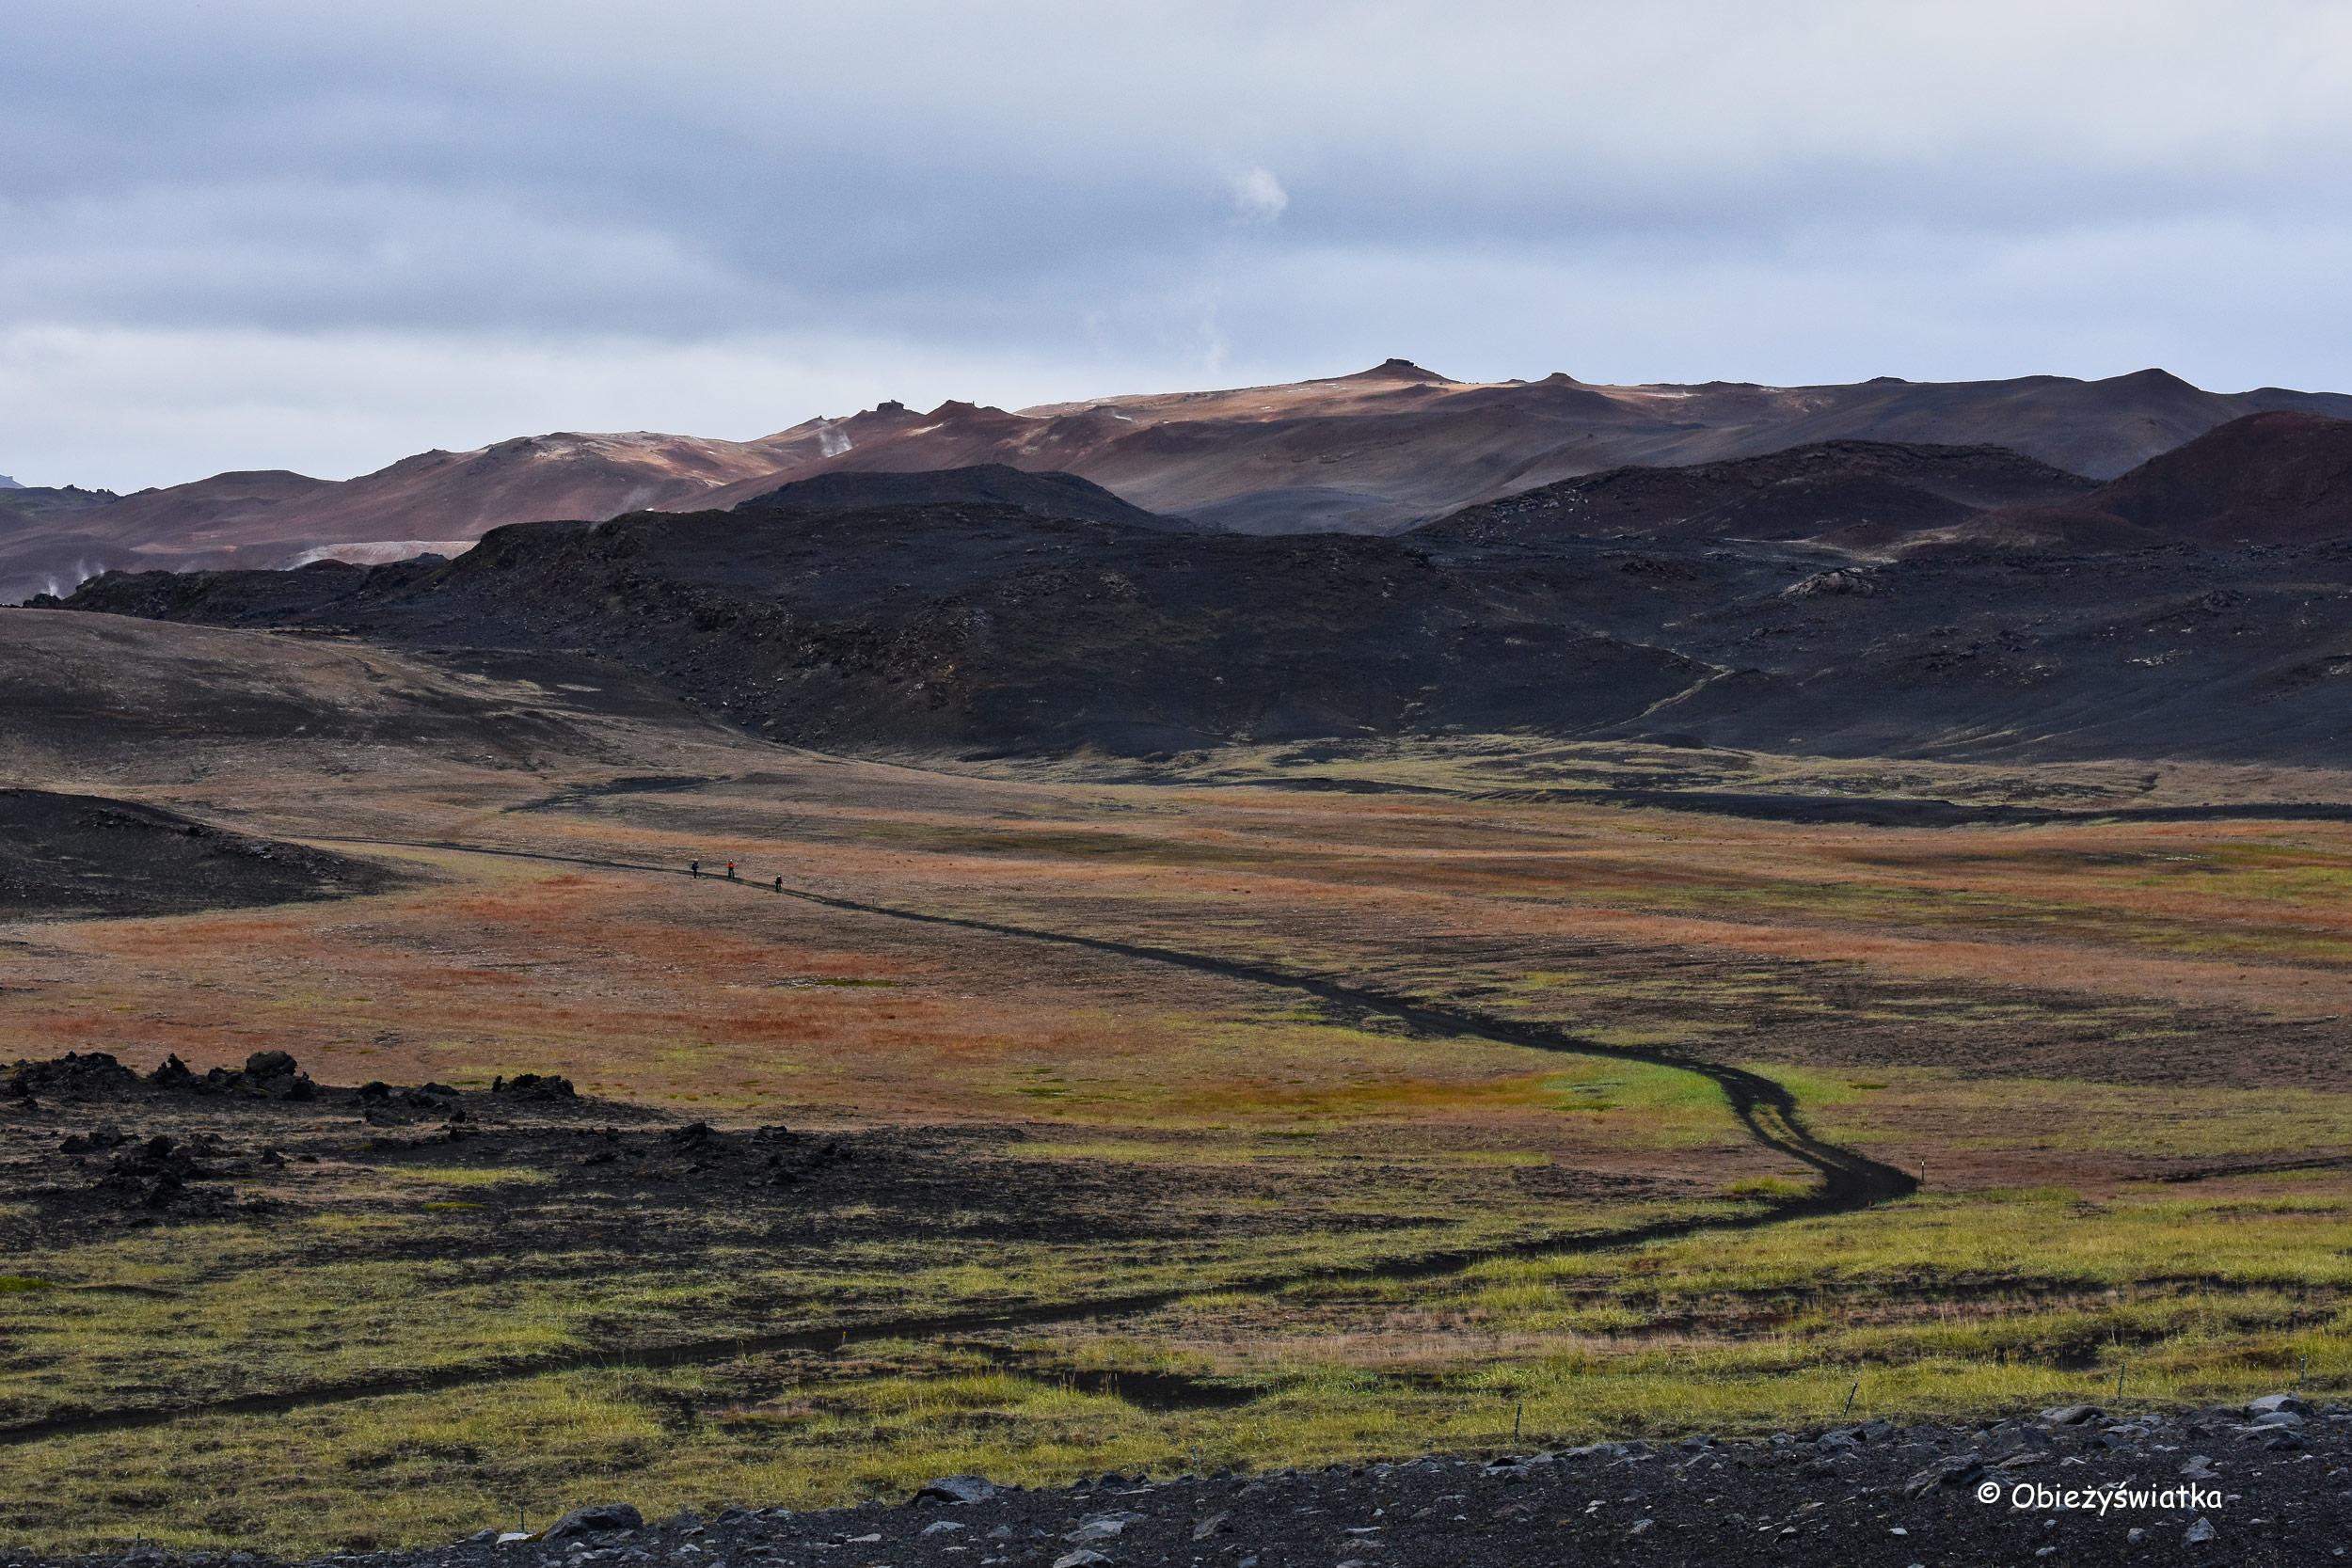 Wokół wulkanu Hverfjall, Islandia